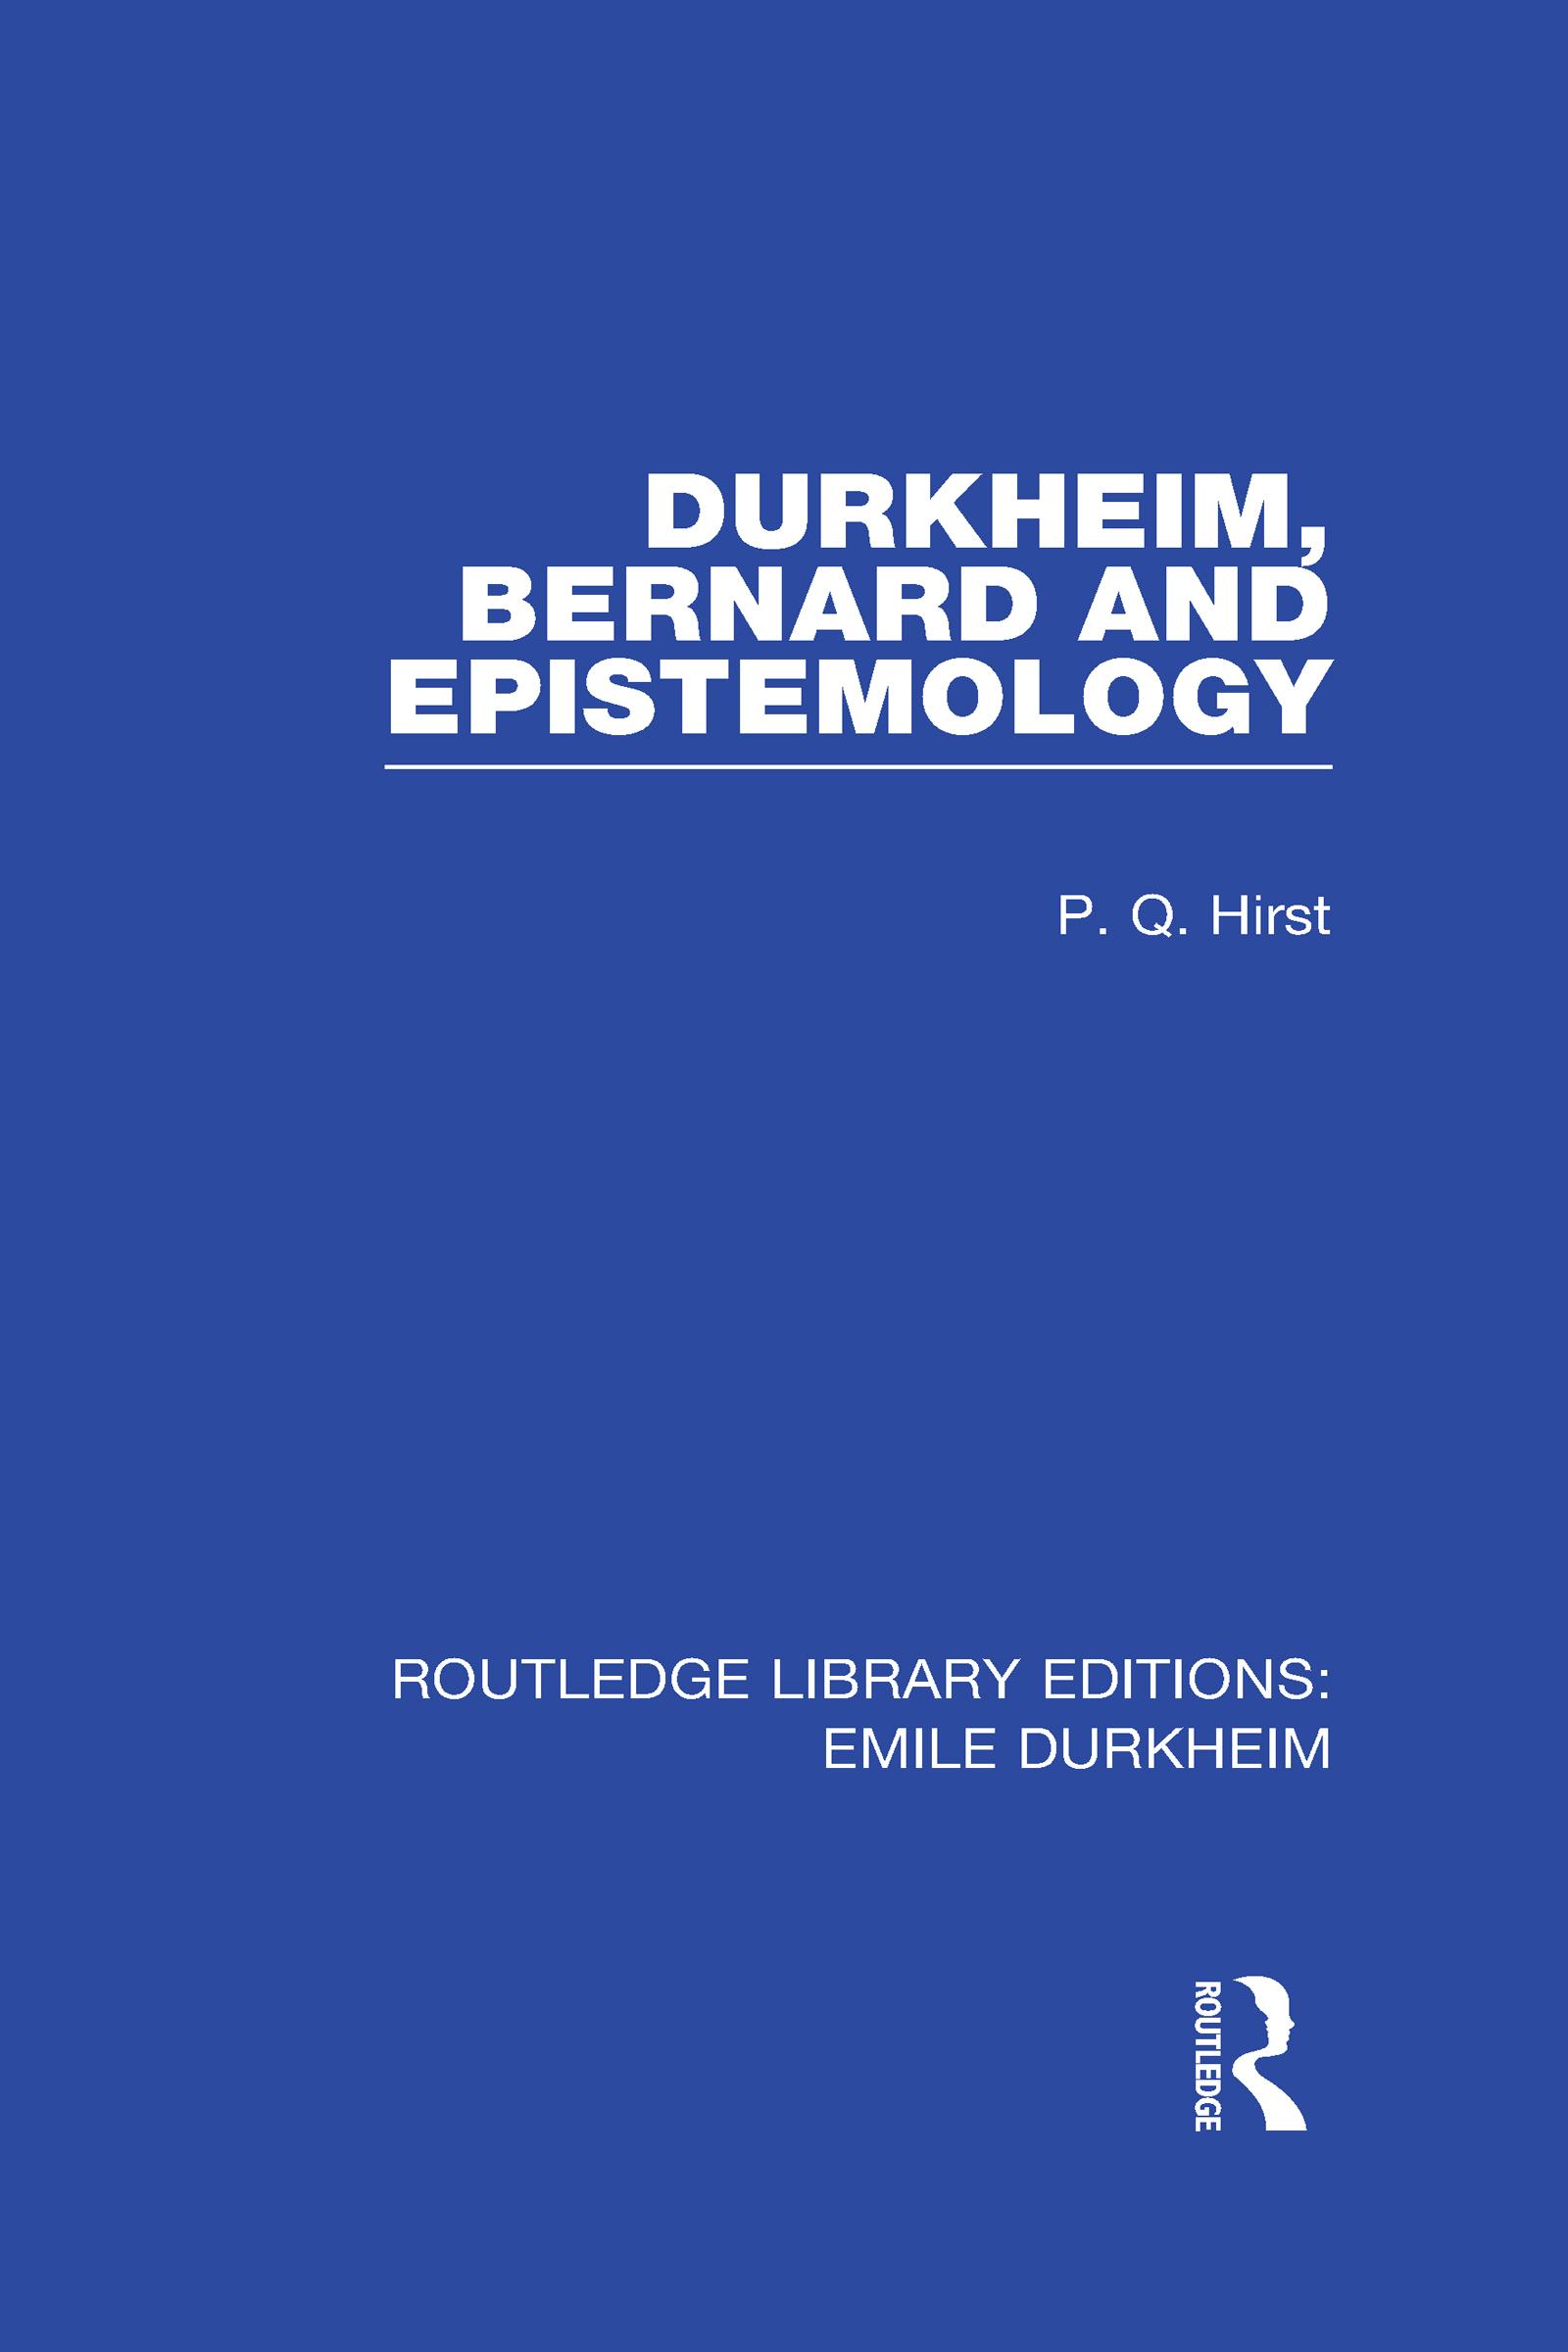 Durkheim, Bernard and Epistemology: 1st Edition (Hardback) book cover